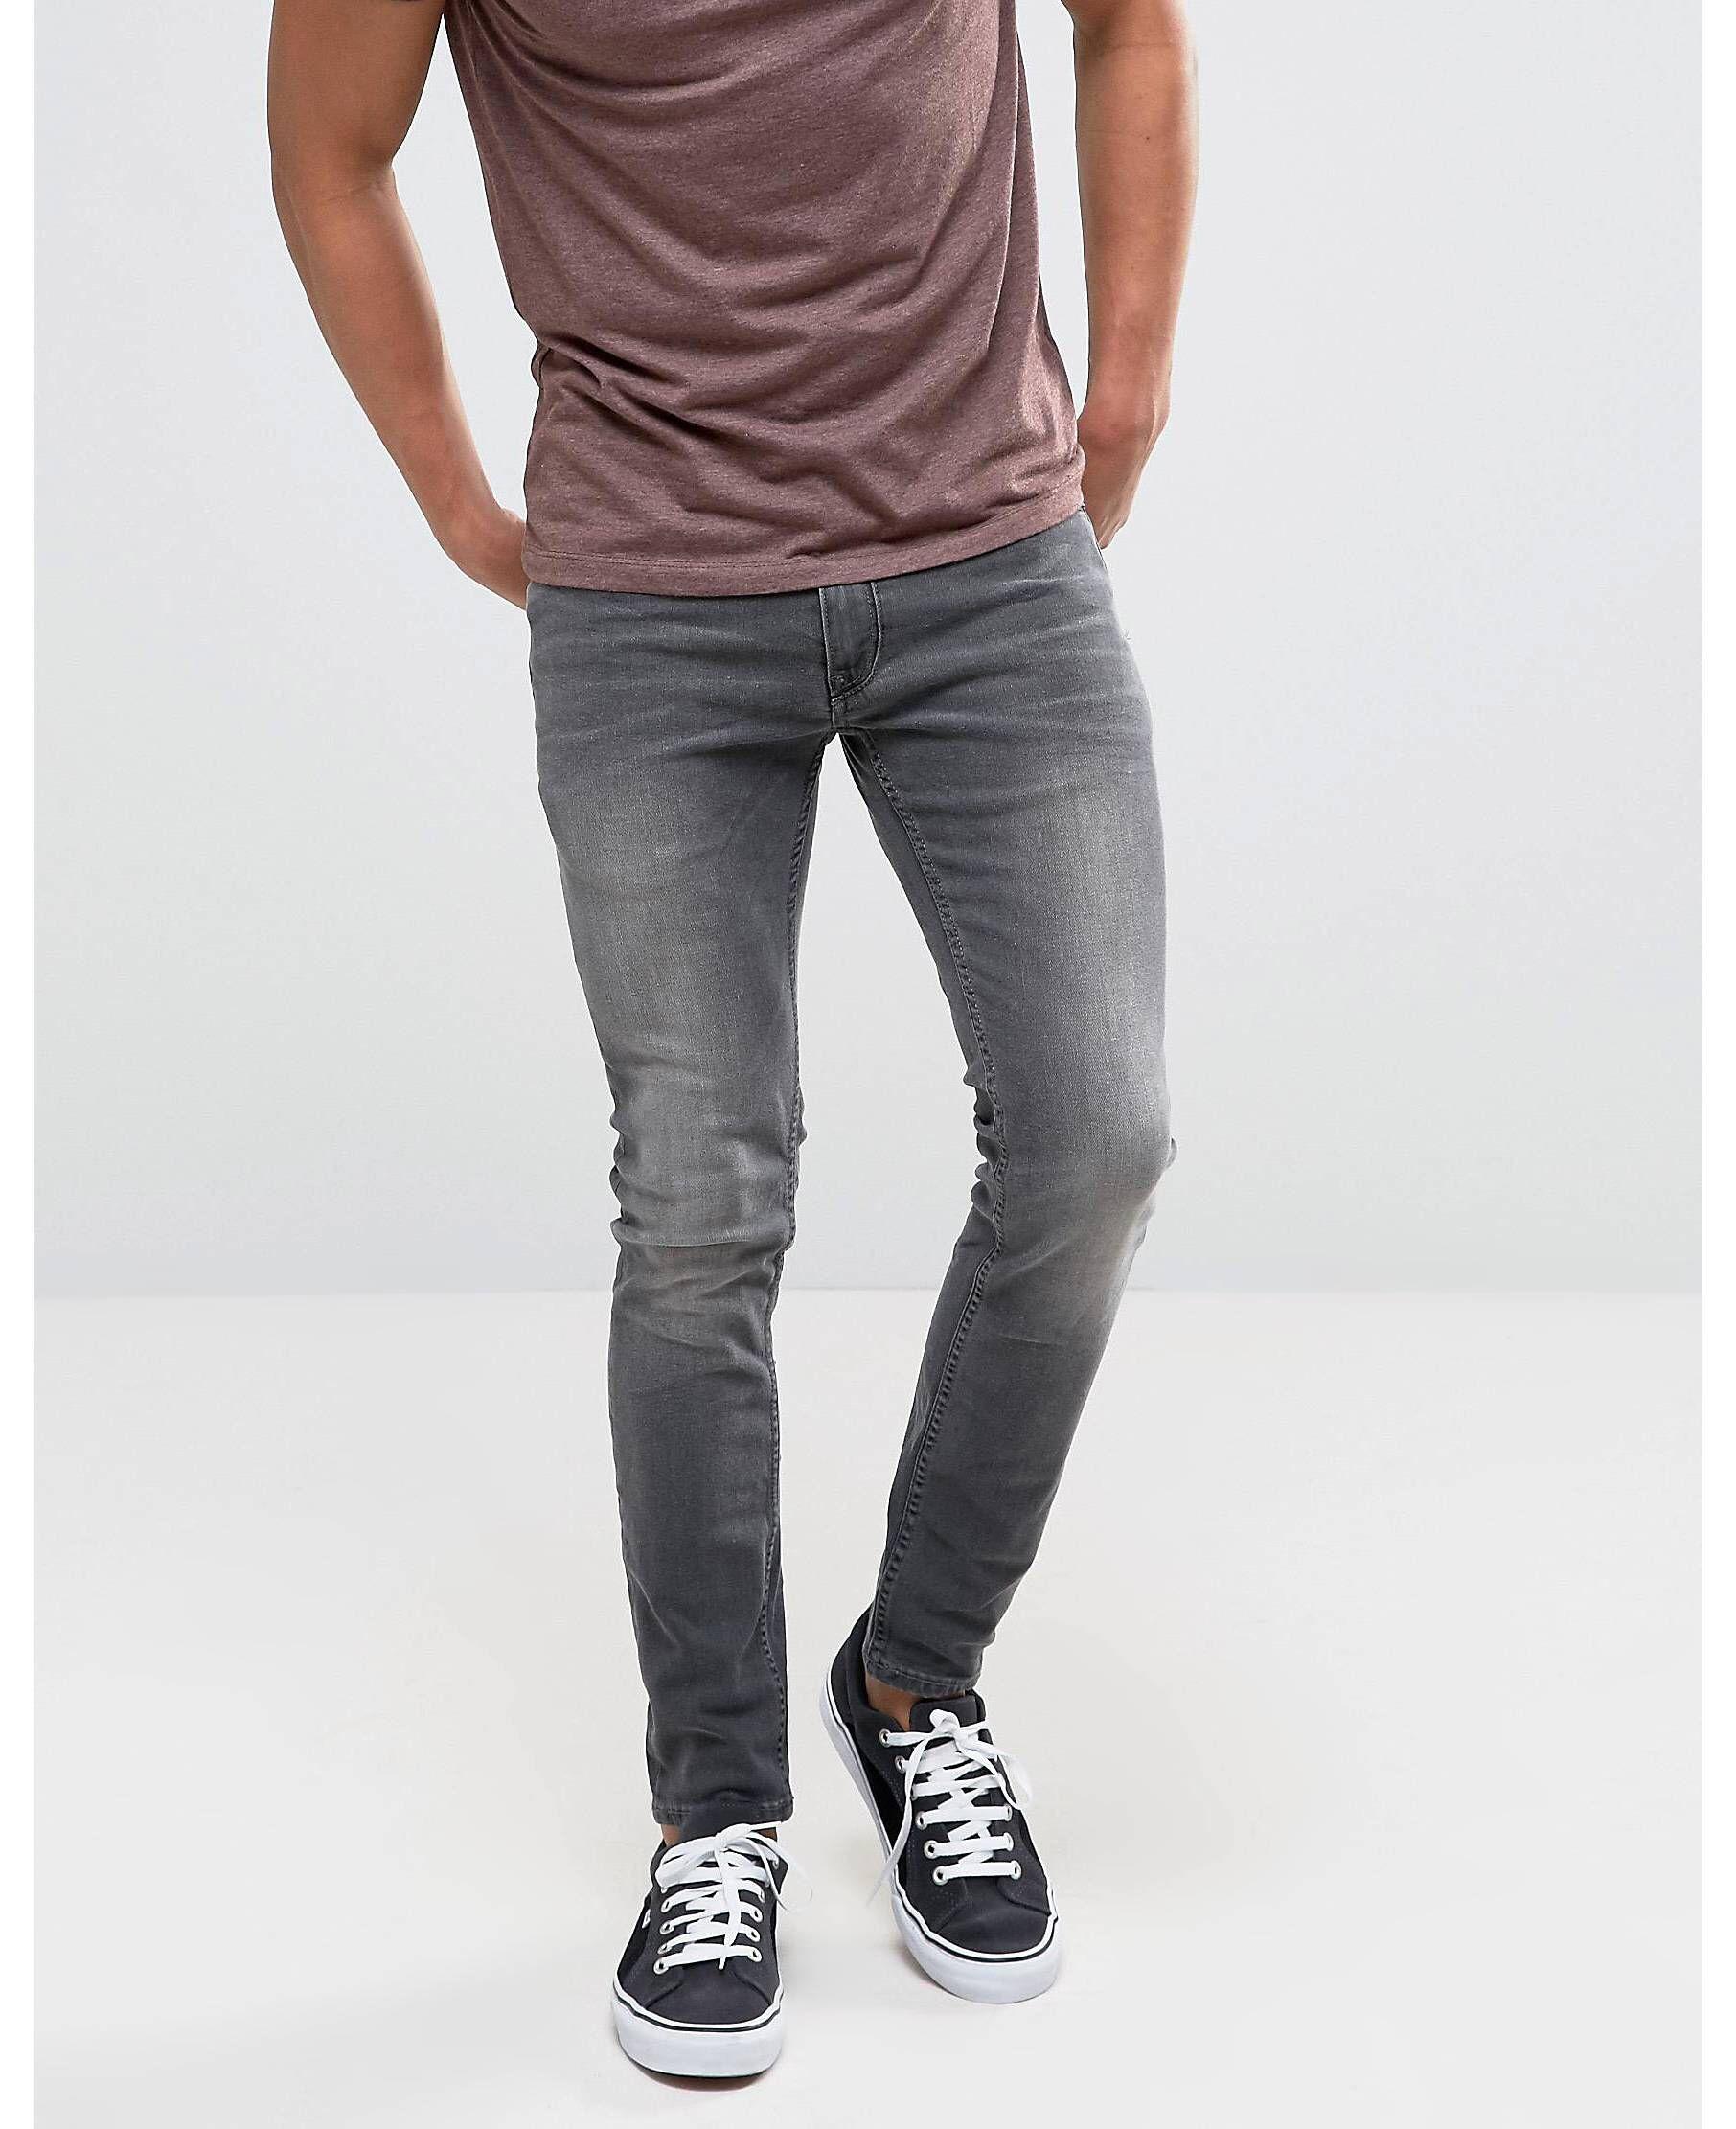 52d2847913e7 Burton Menswear Superskinny Black Washed Jeans in 2019